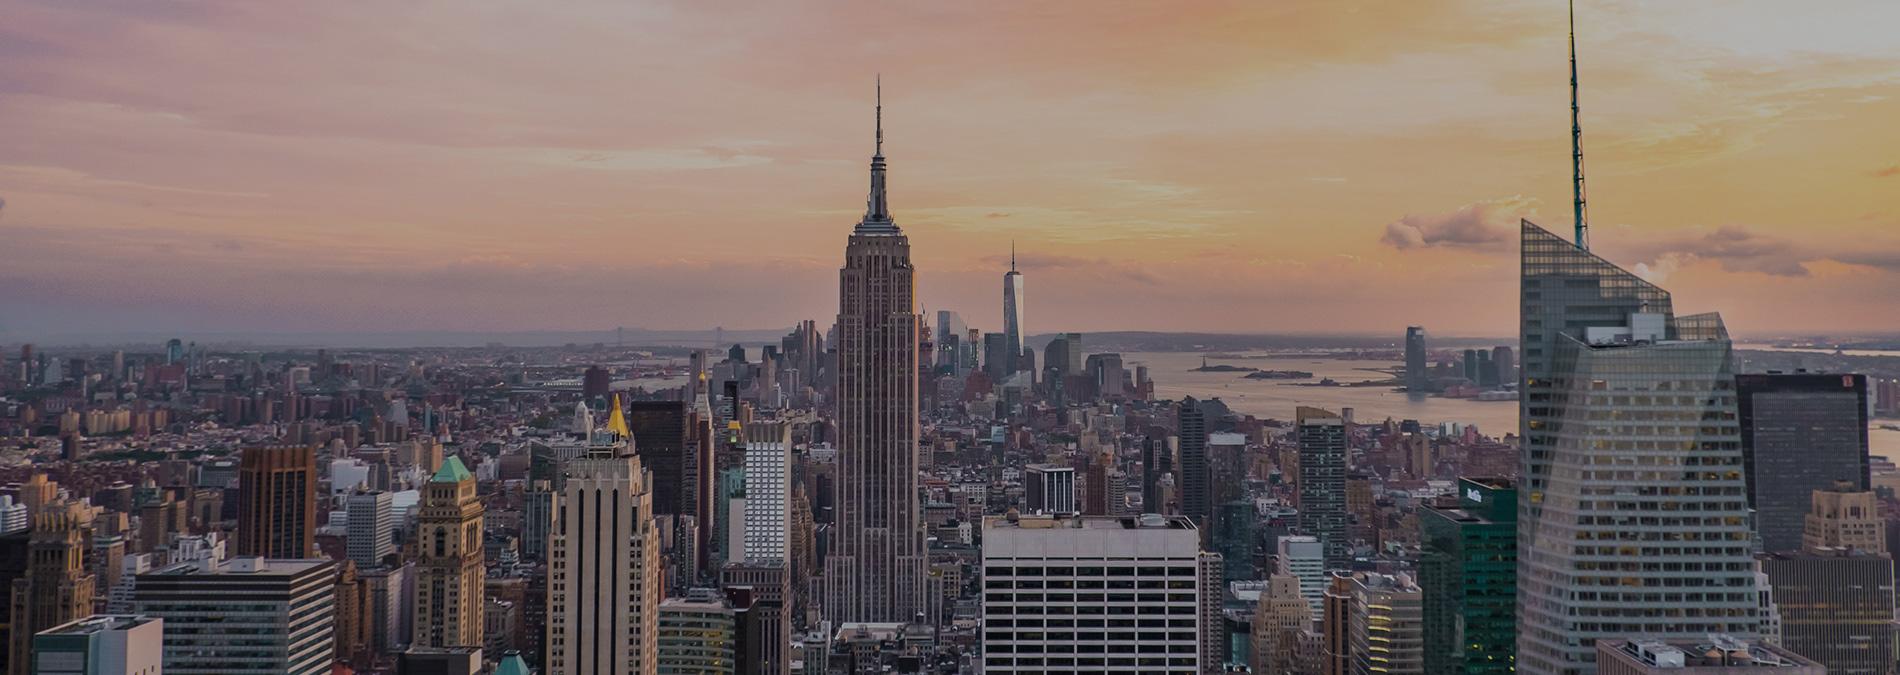 new-york-skyline-empire-state-sunset-1900x675